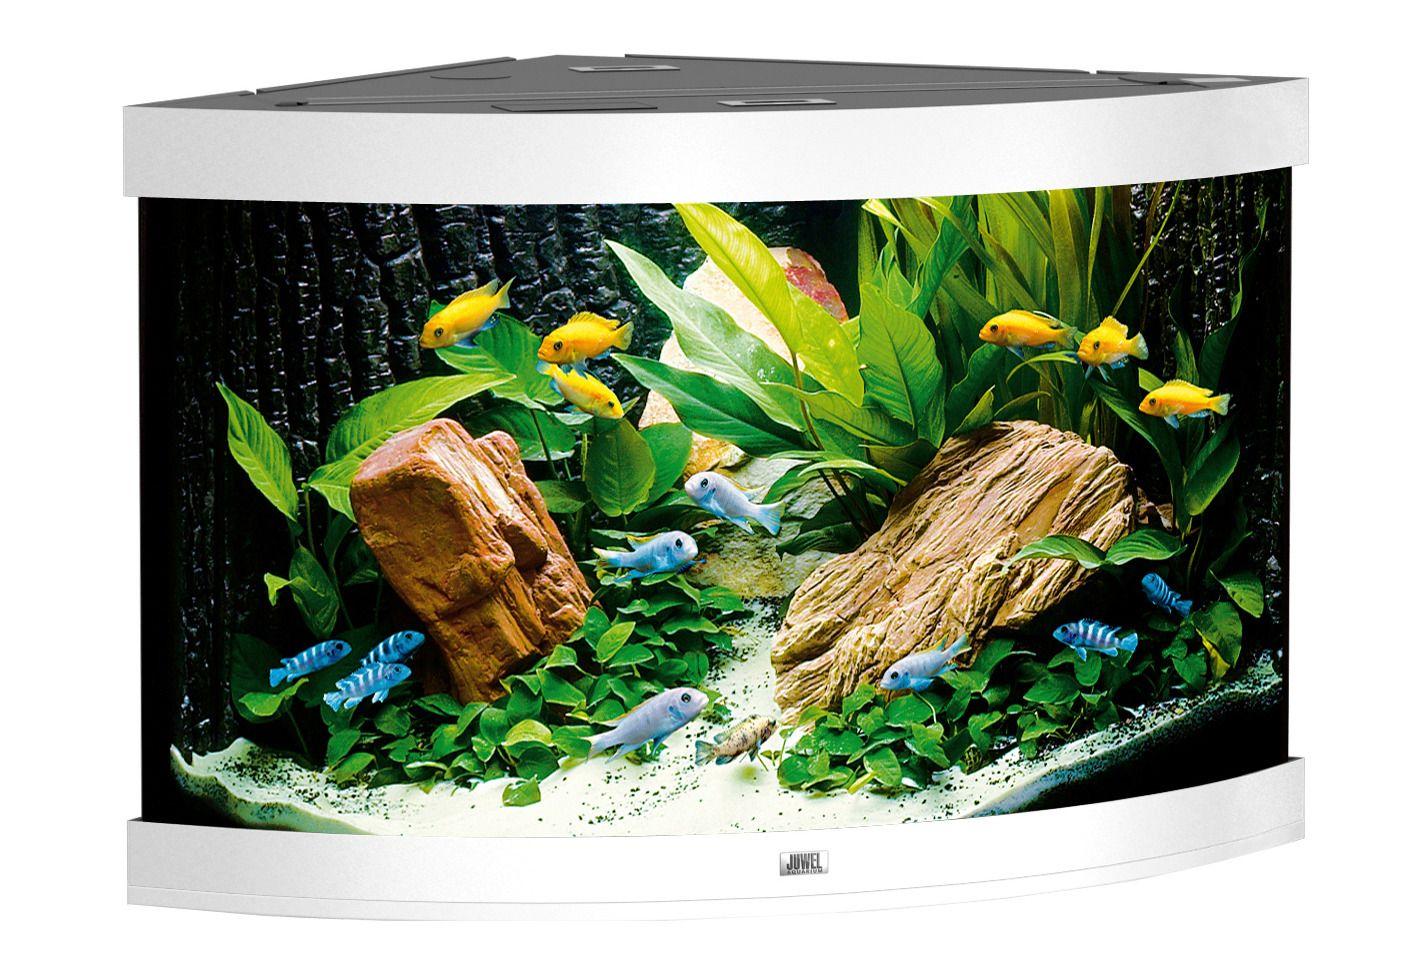 aquarium trigon 190 schwab versand s wasseraquarium. Black Bedroom Furniture Sets. Home Design Ideas